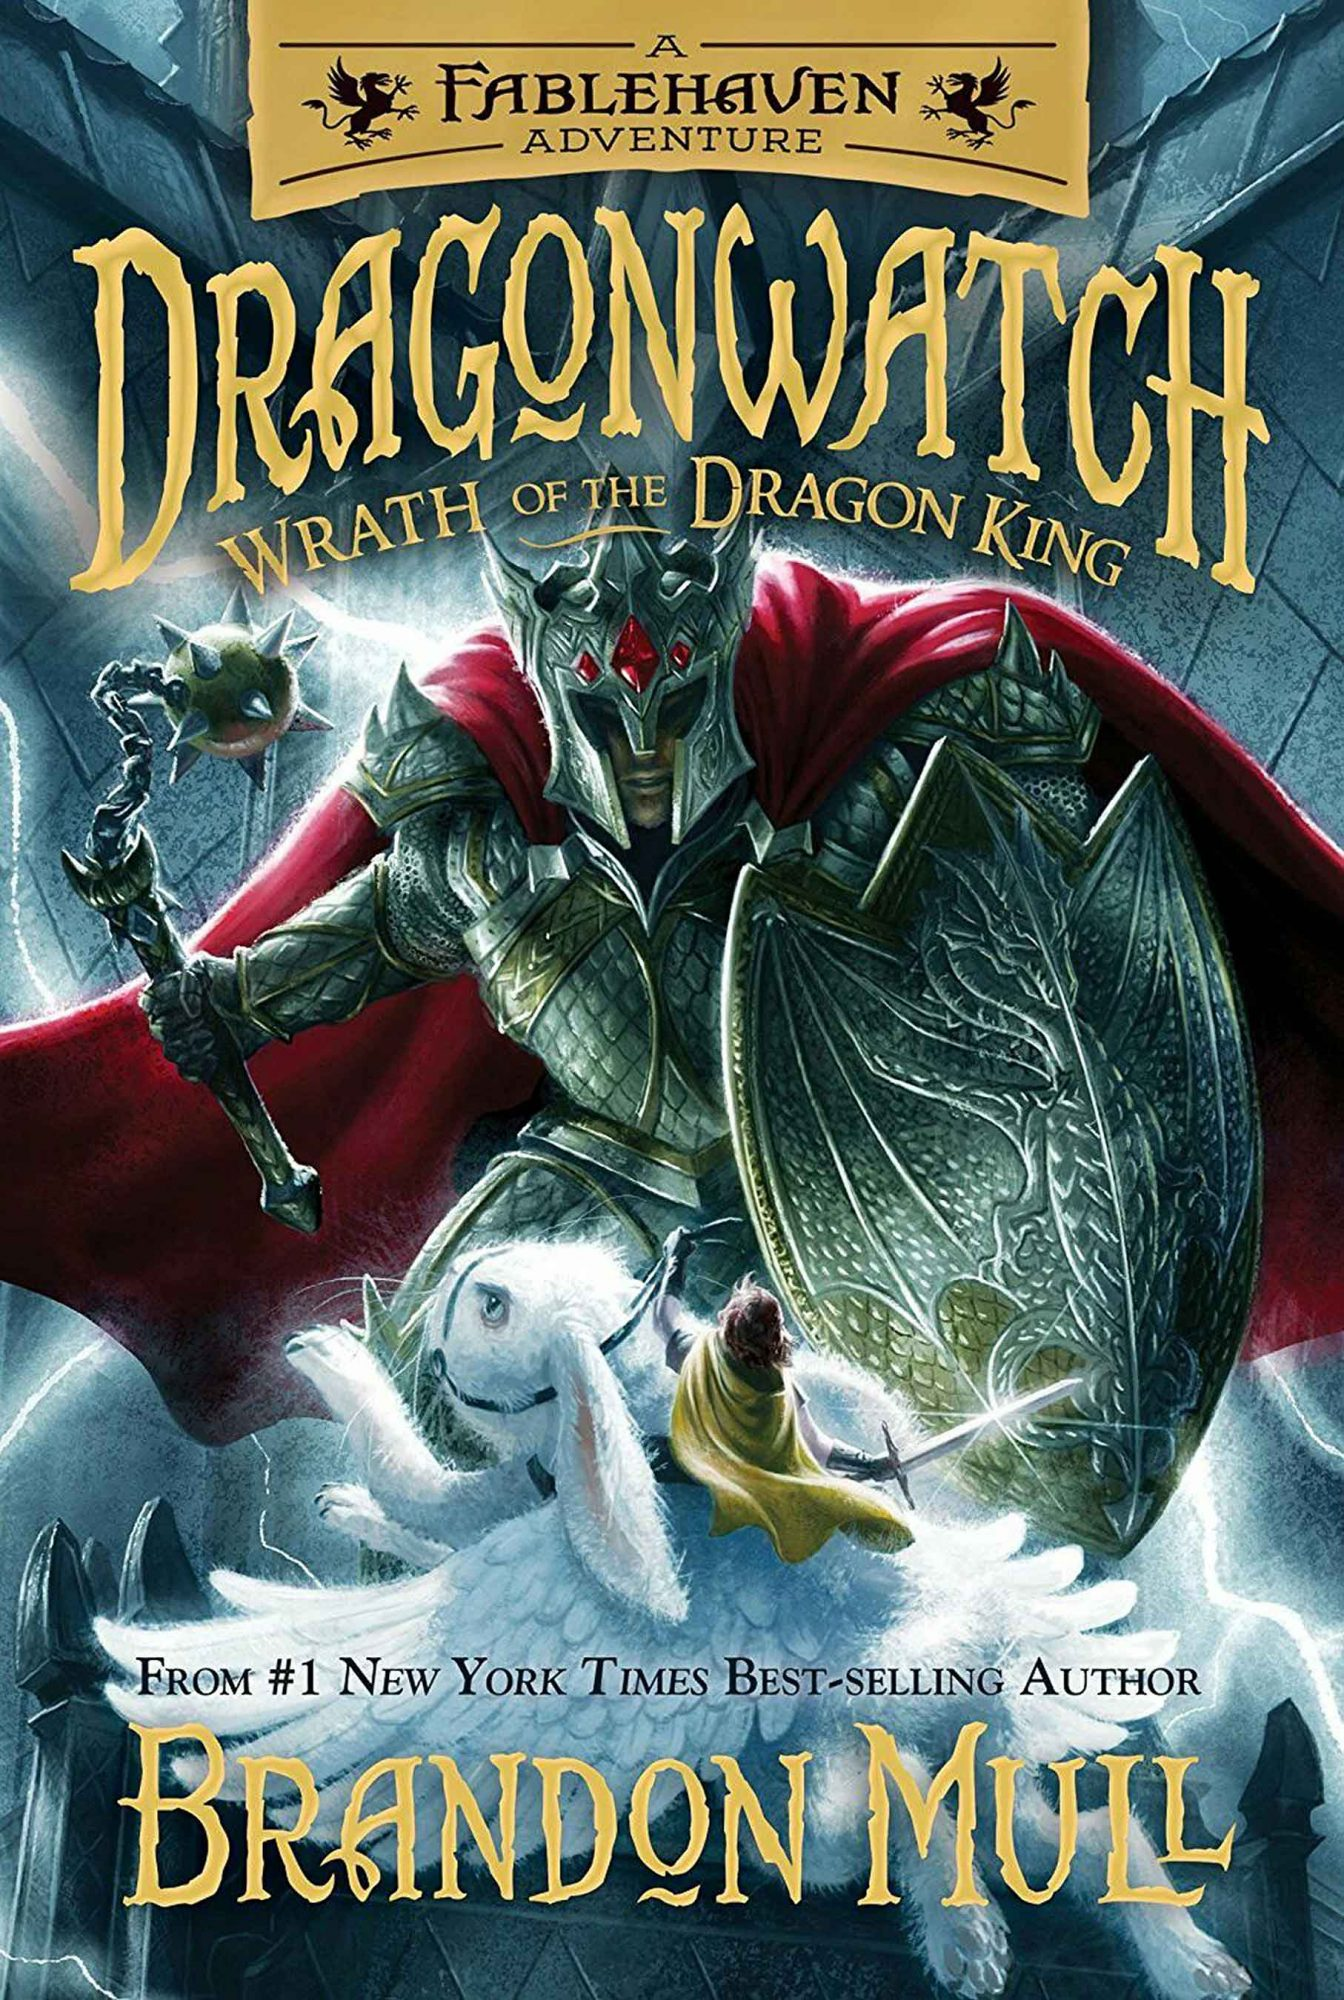 Dragonwatch Wrath of the Dragon KingBrandon Mull